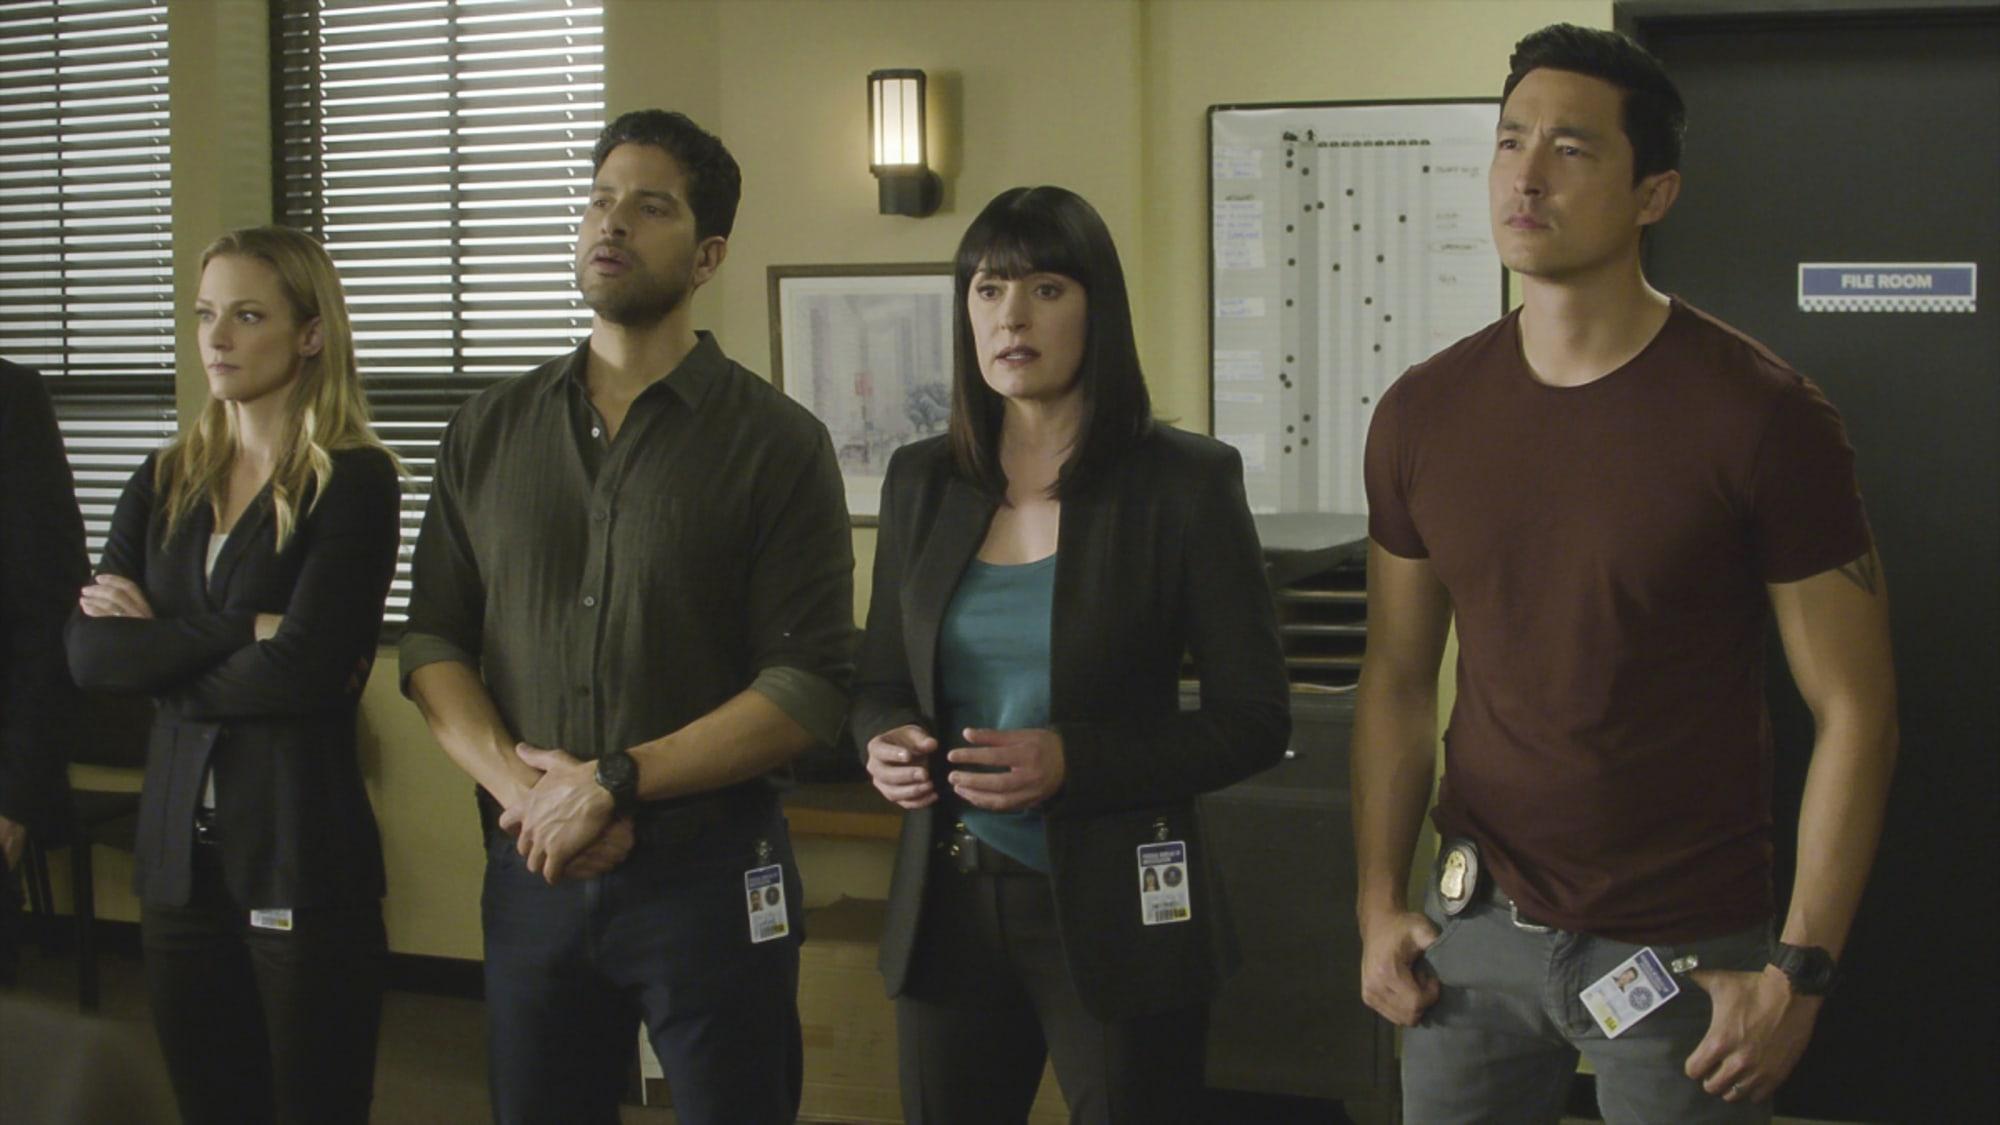 watch criminal minds season 13 episode 18 online free